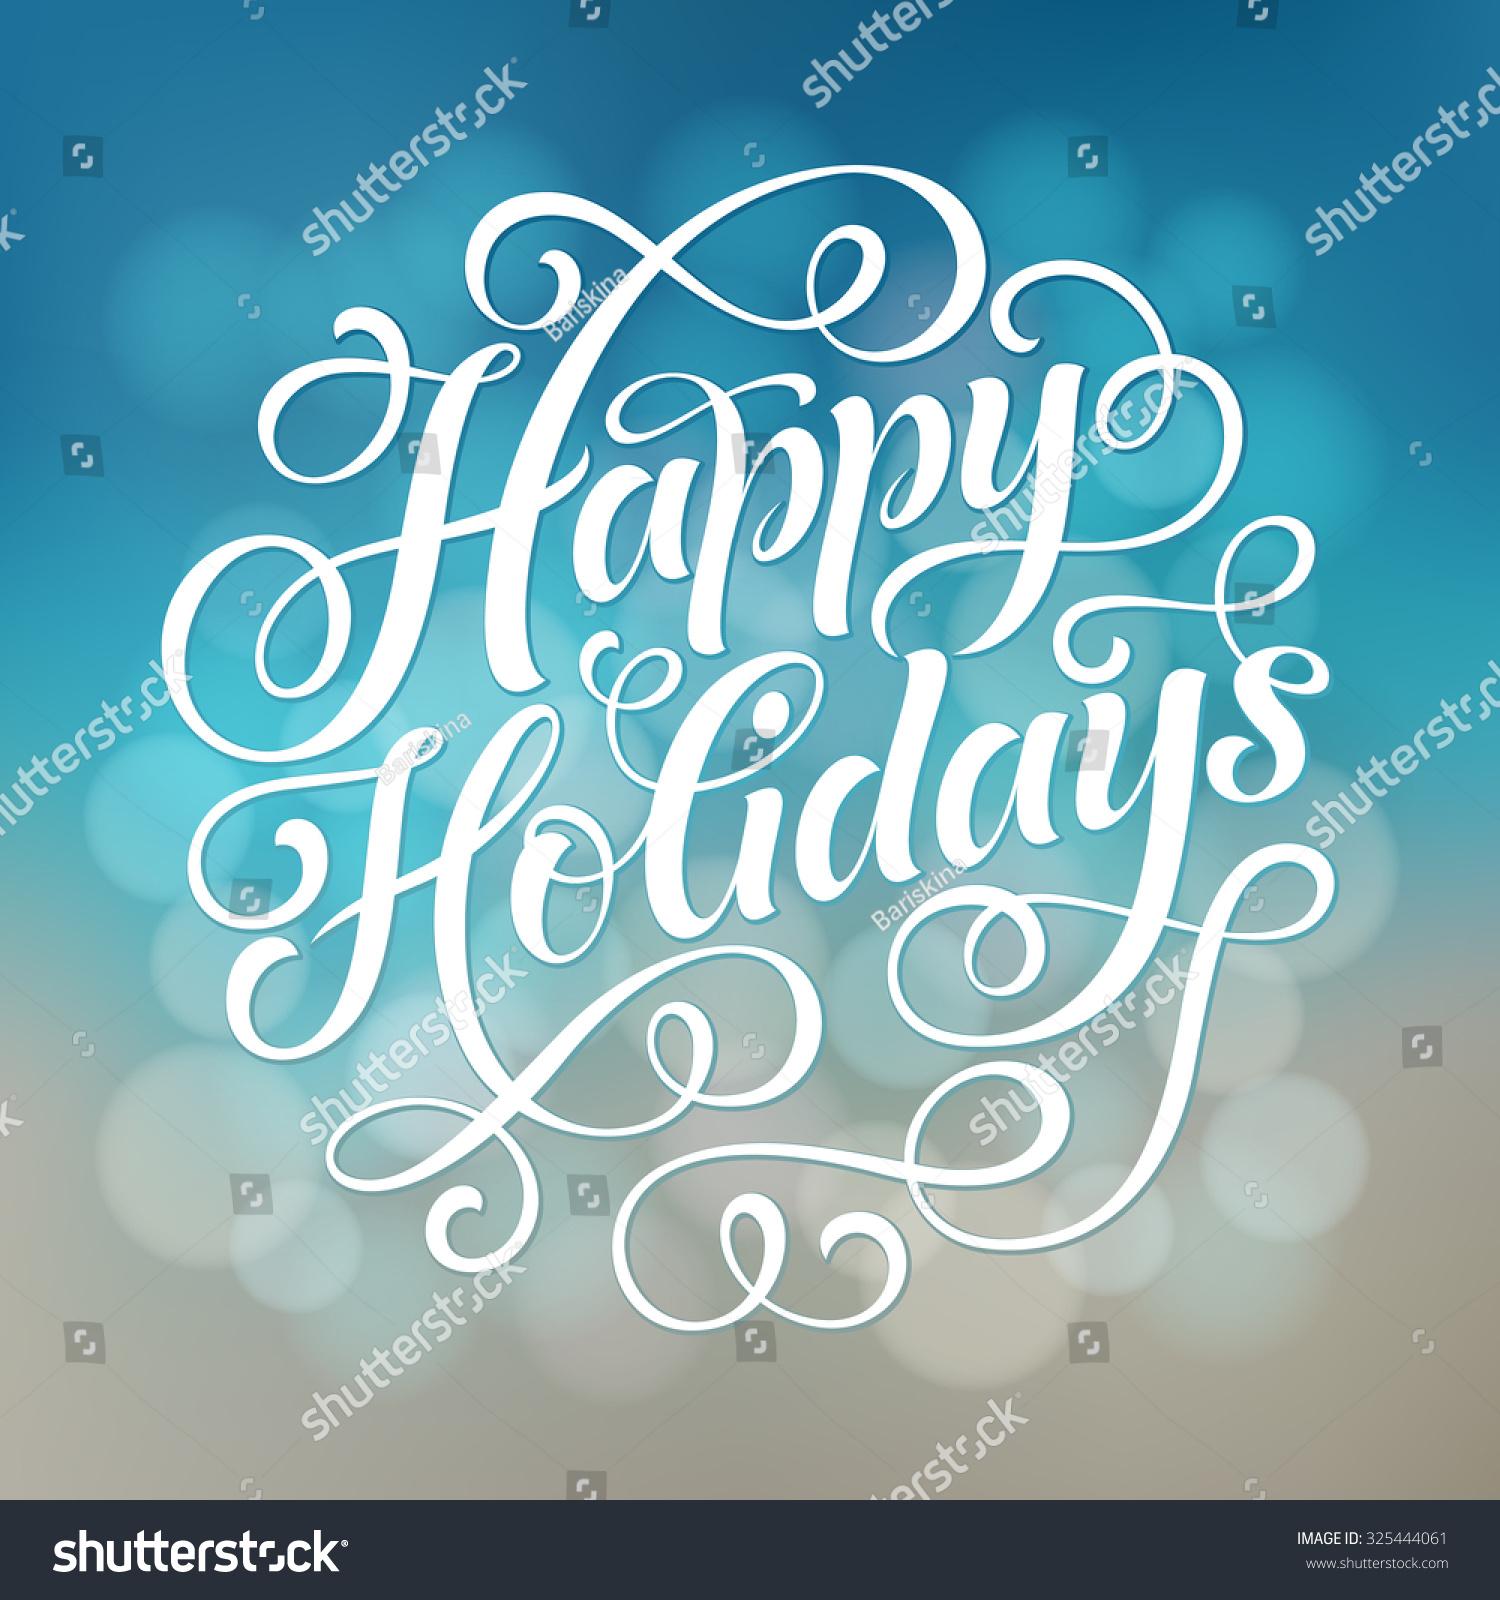 Holidays: Happy Holidays Vector Text On Defocus Stock Vector